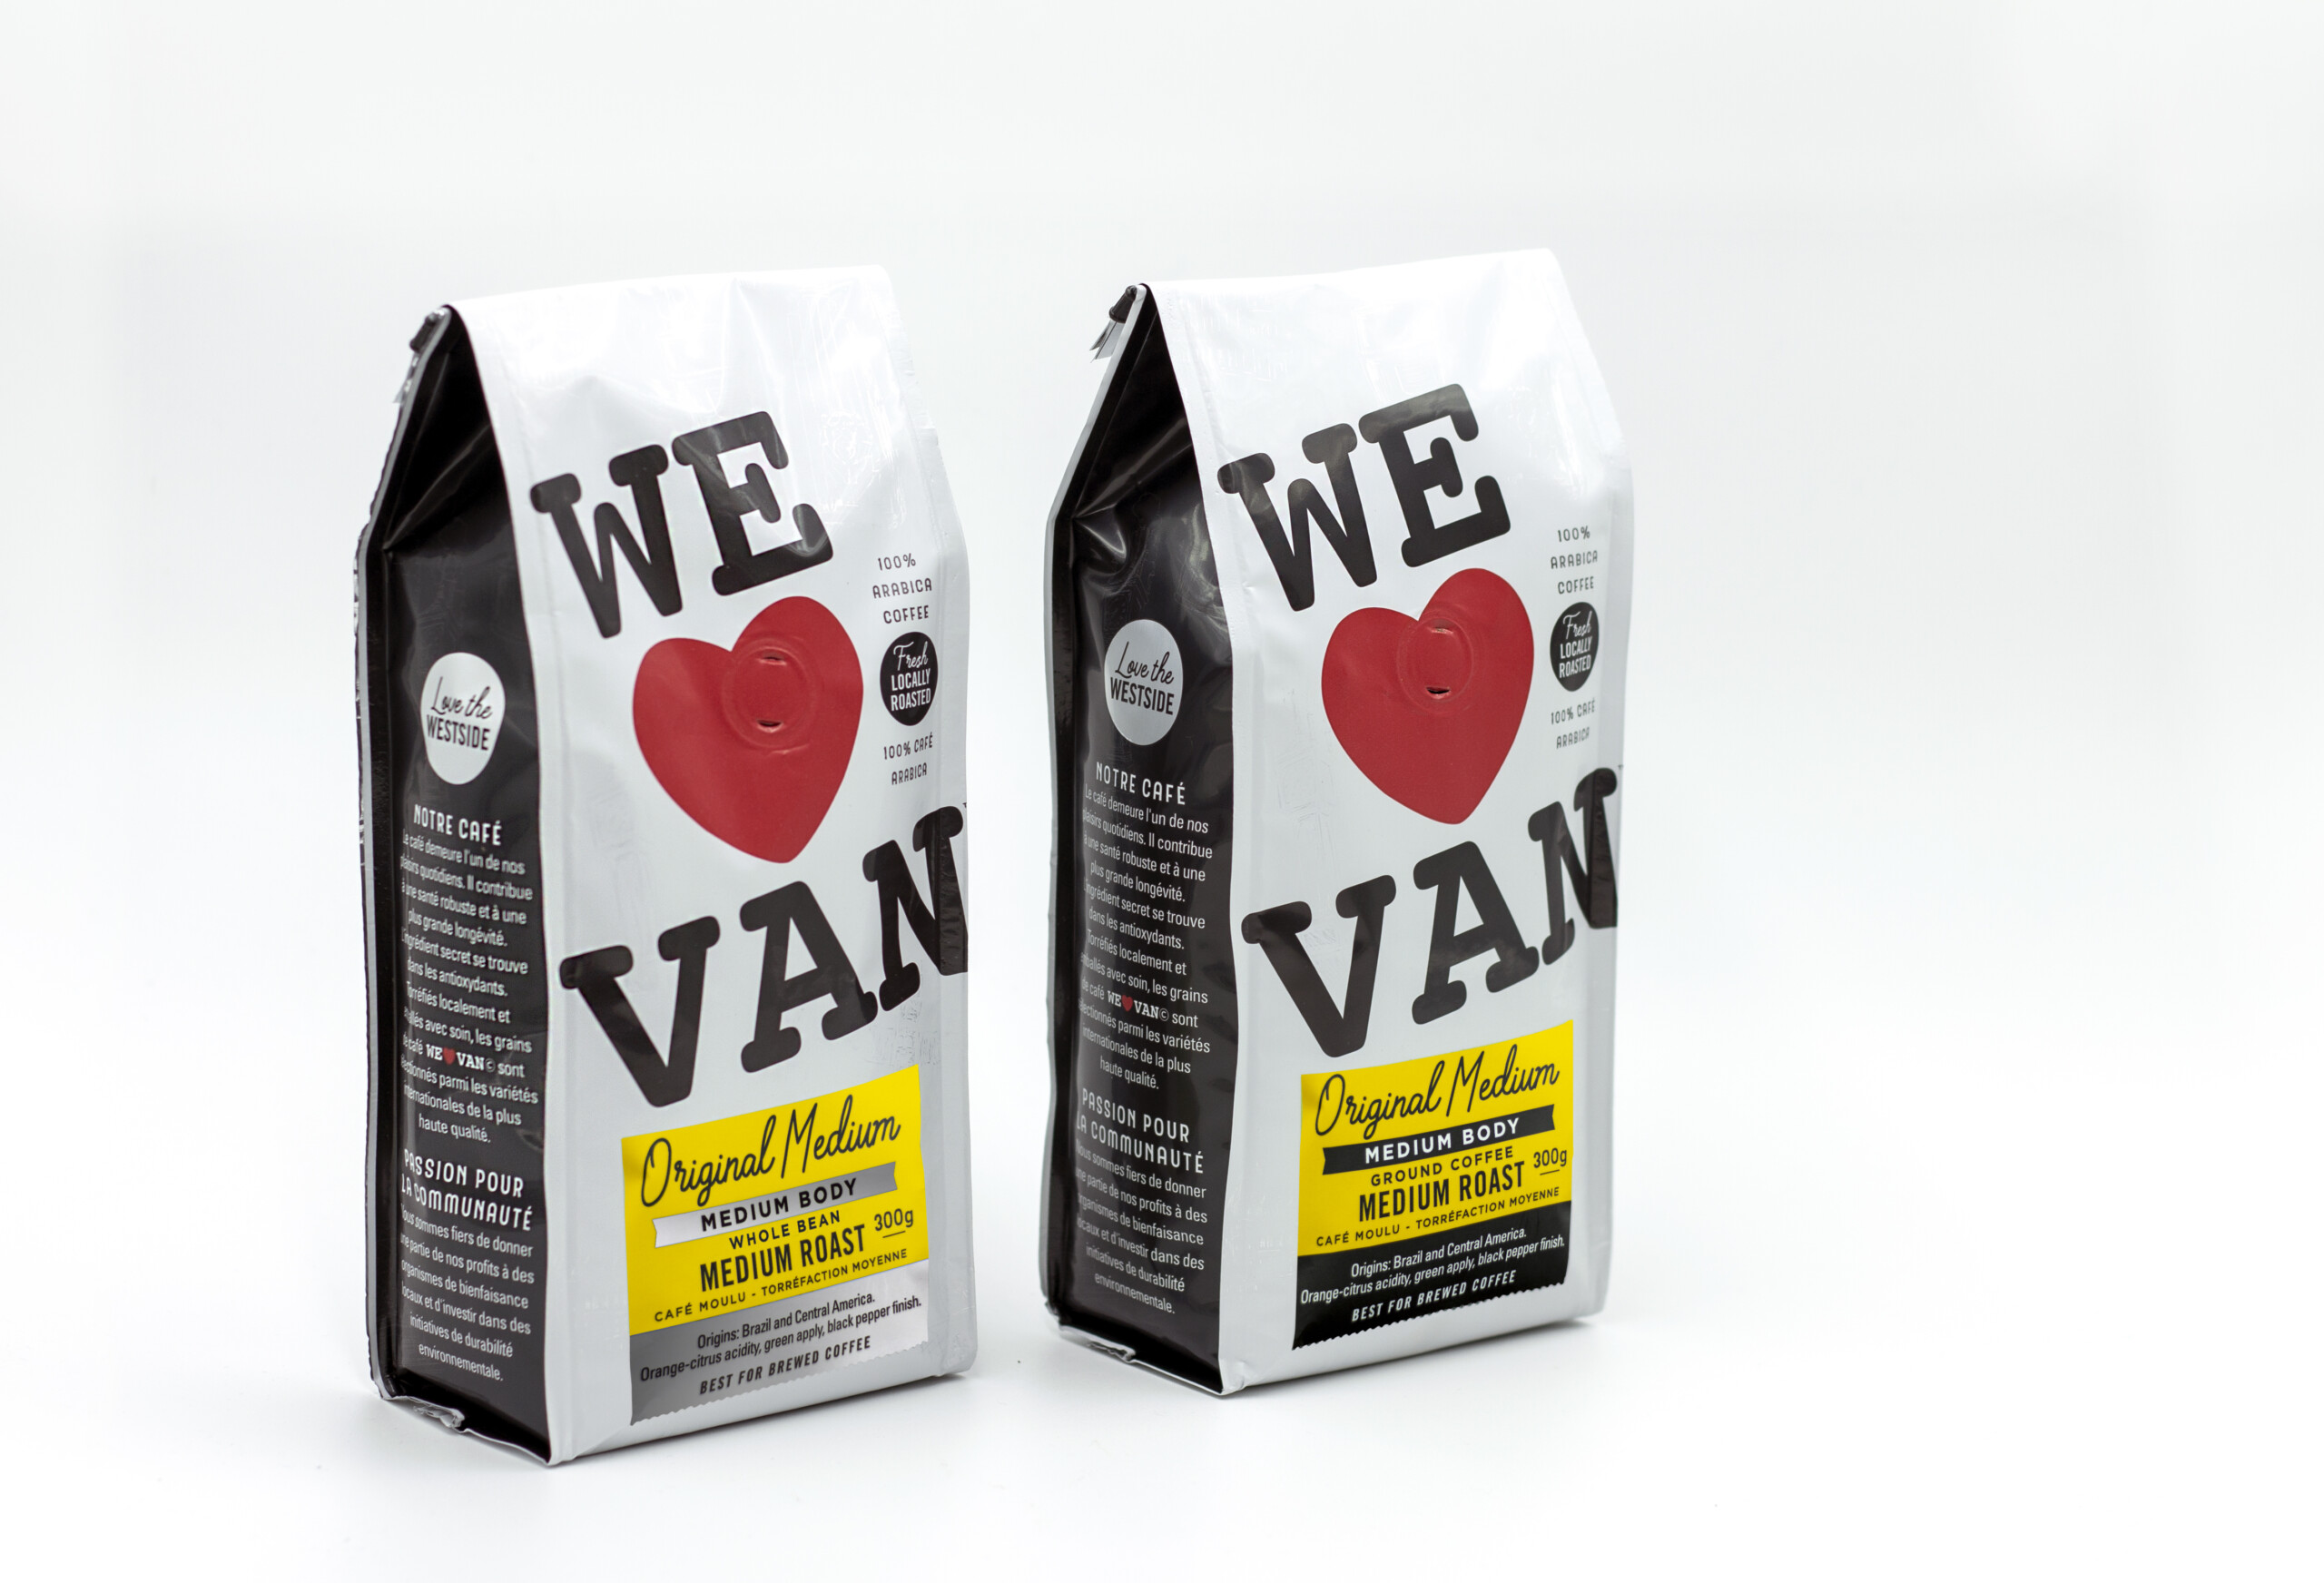 Original Medium Coffee